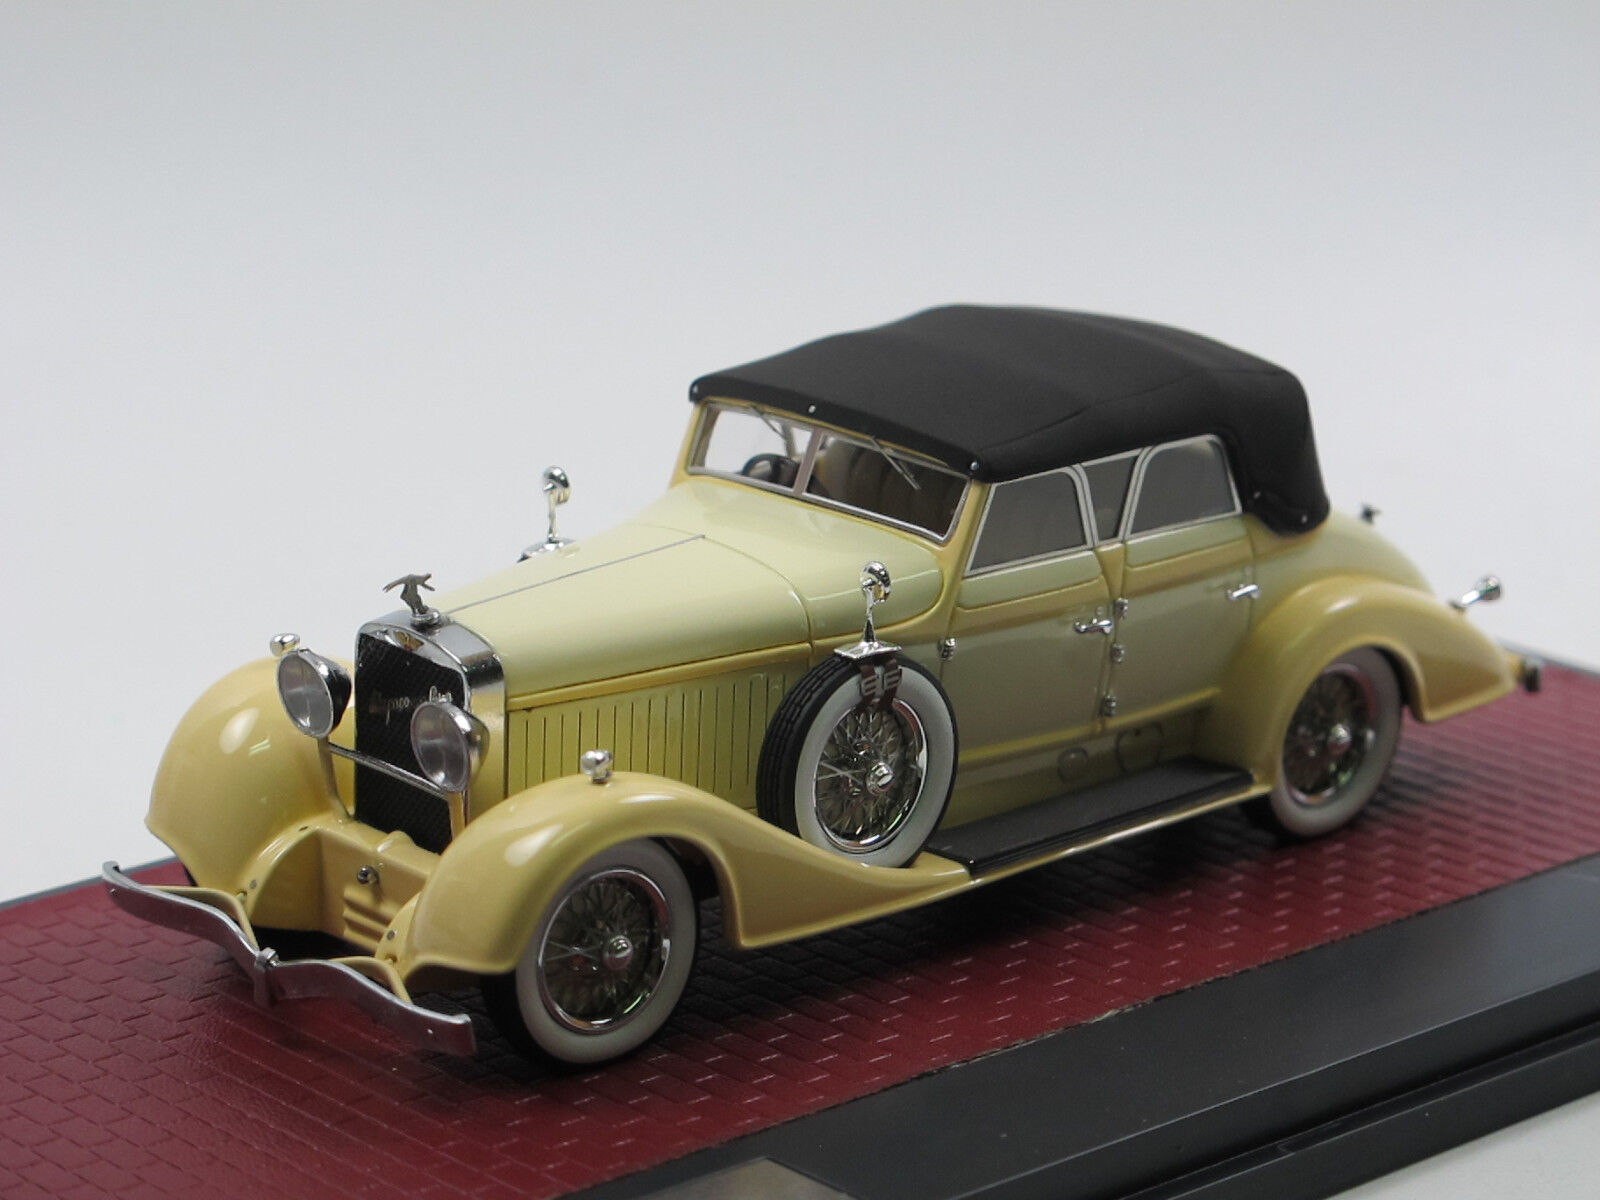 Matrice 1928 HISPANO-SUIZA h6c Closed Convertible by Hibbard & Darrin Cream 1 43